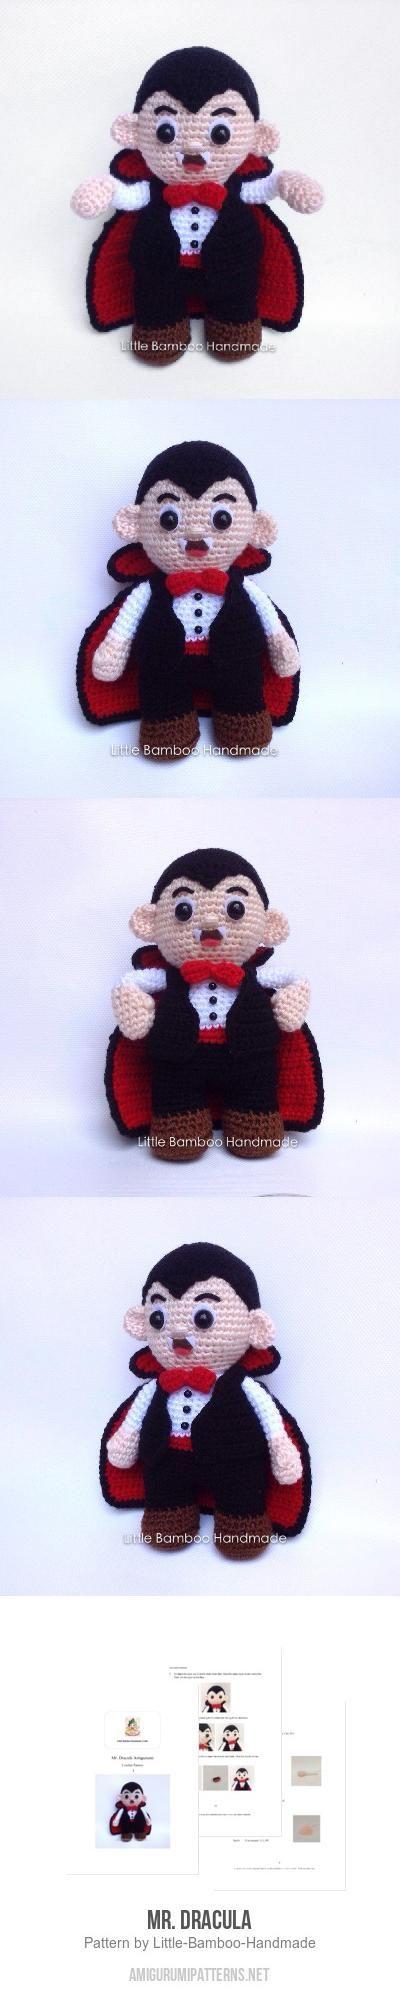 Mr. Dracula amigurumi pattern by Little Bamboo Handmade | Märchen ...